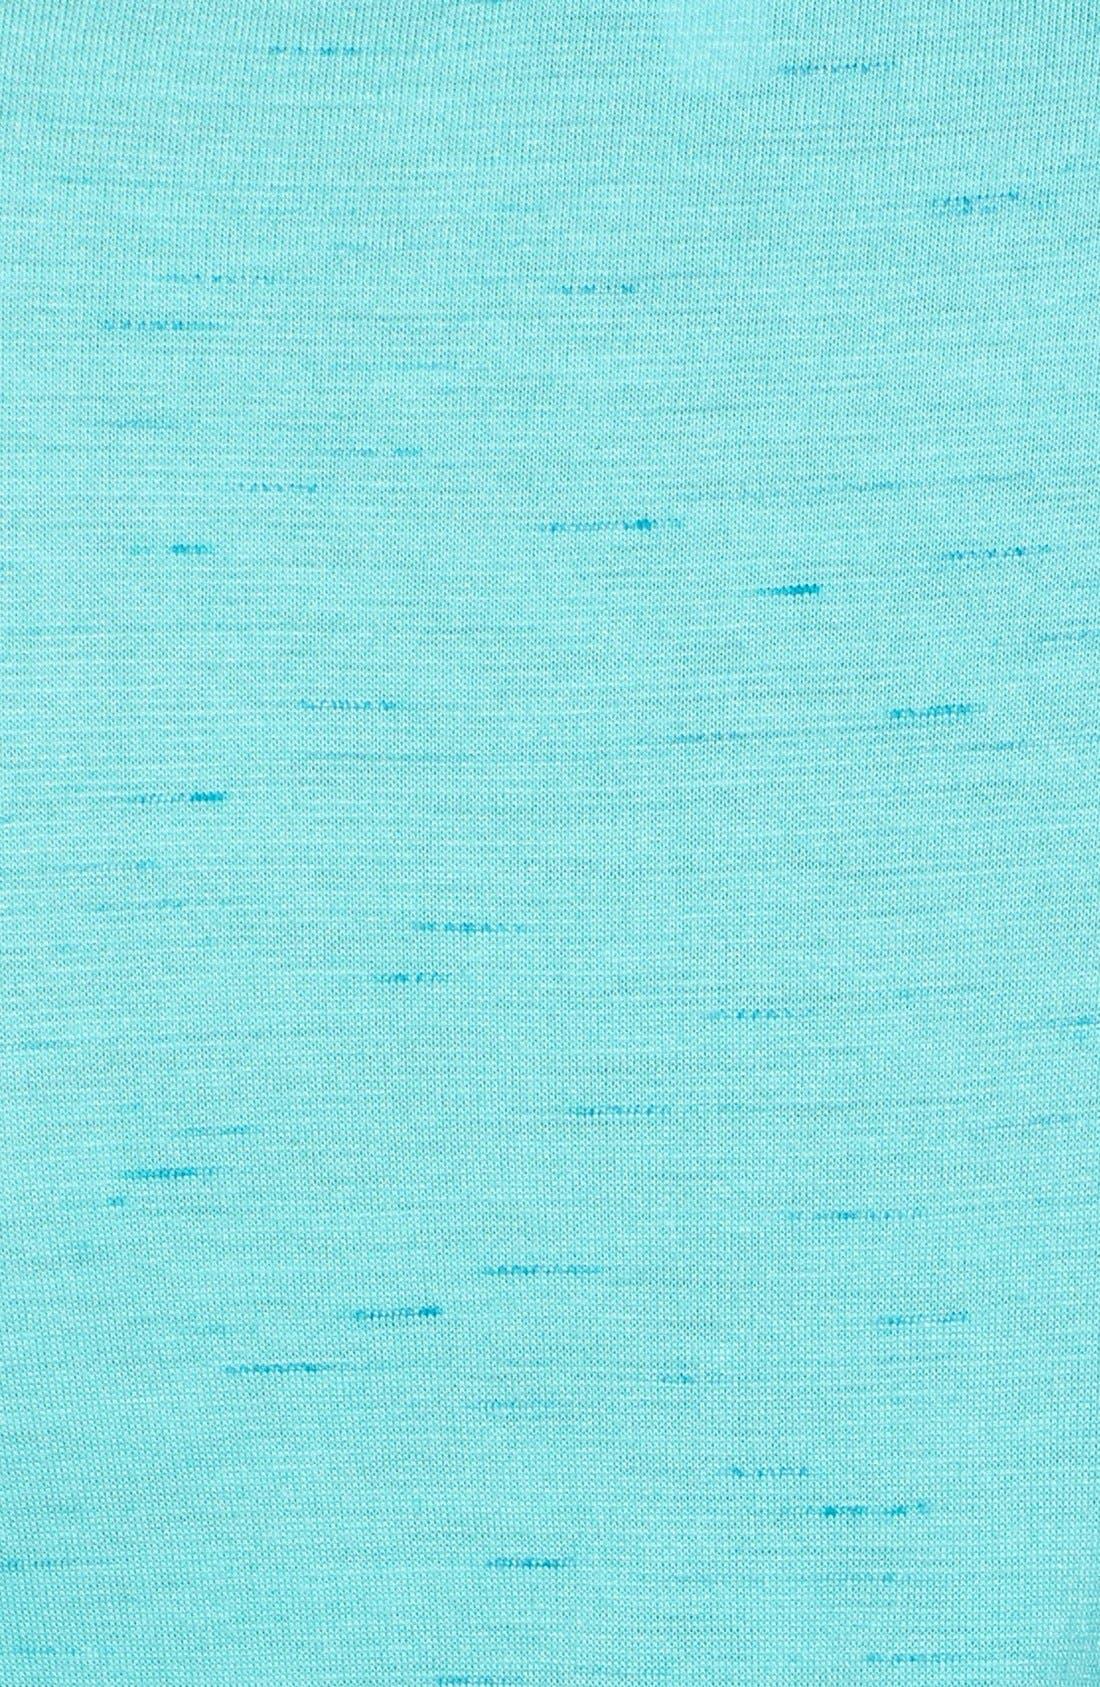 Alternate Image 3  - Splendid 'Tracer' Mélange Knit Tee